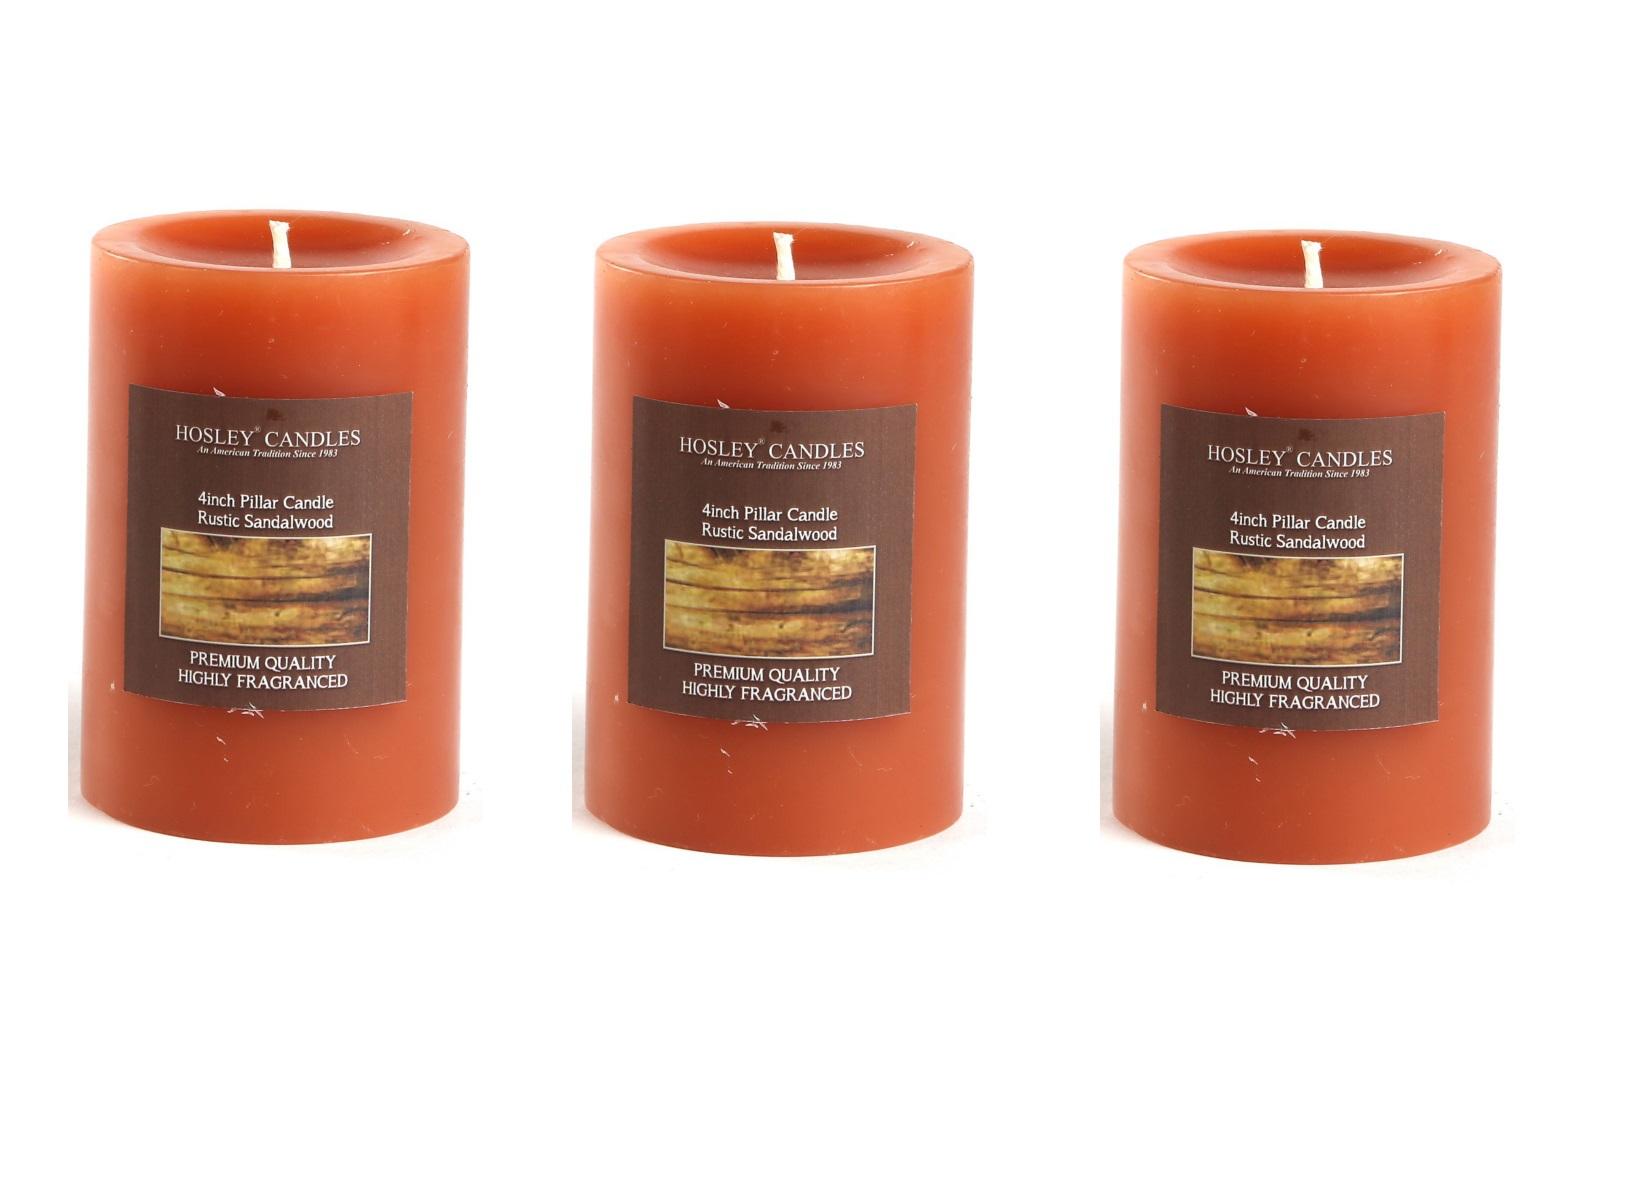 Hosley Set of 3 Rustic Sandalwood 4Inchs Pillar Candles